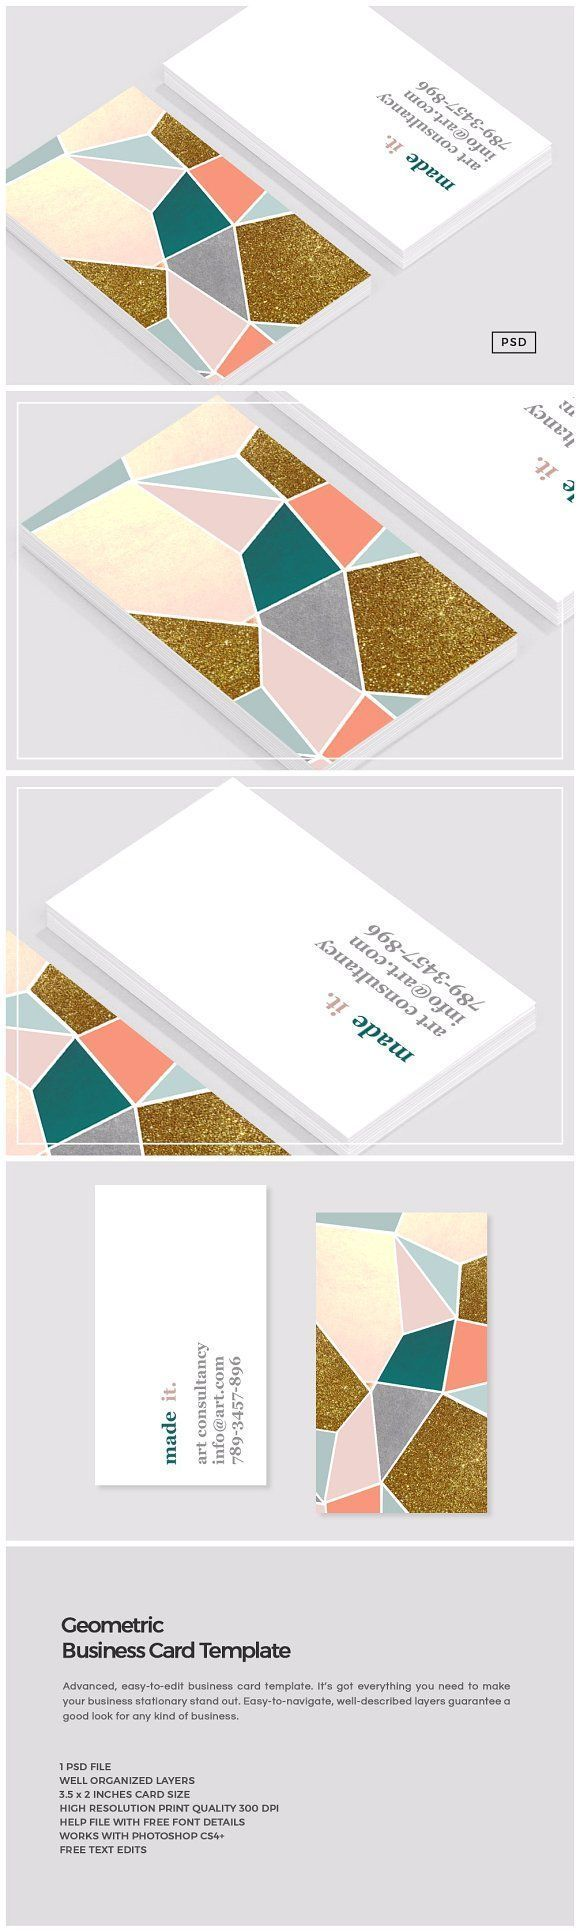 Best 25 free business cards ideas on pinterest free business geometric business card template by the design label on creativemarket magicingreecefo Images